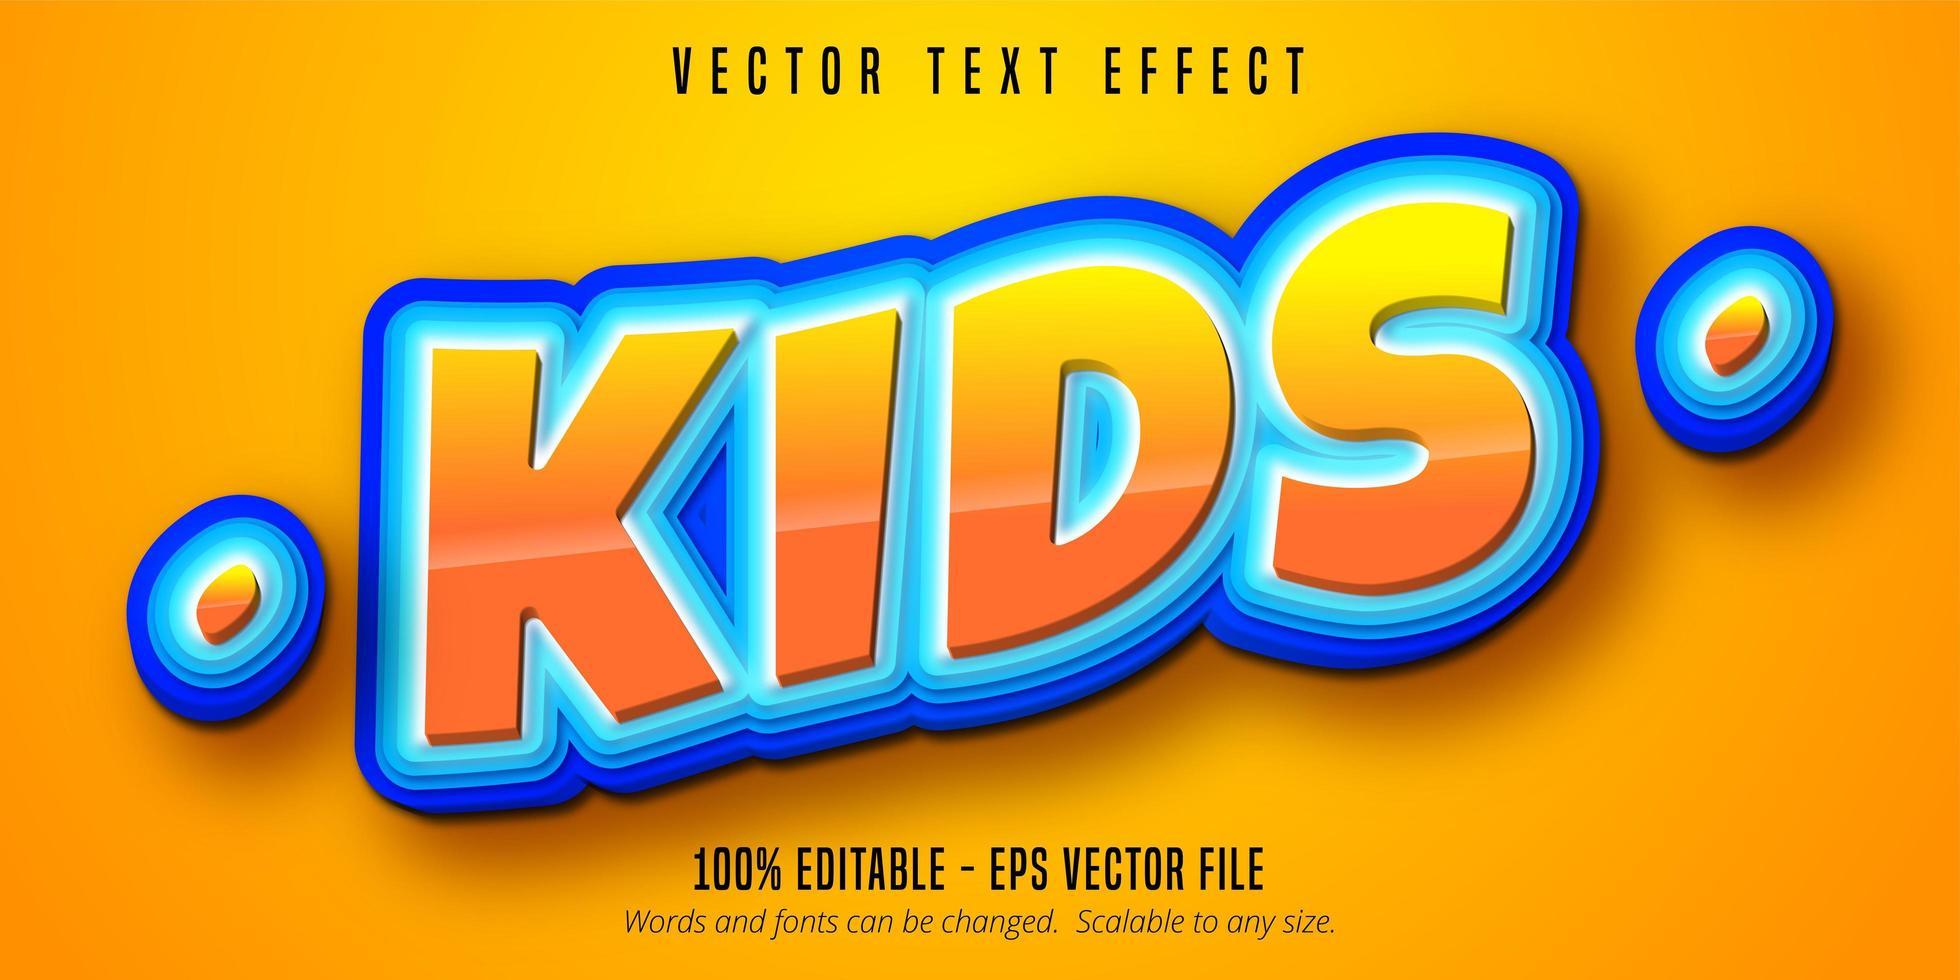 barn text, tecknad stil text effekt vektor